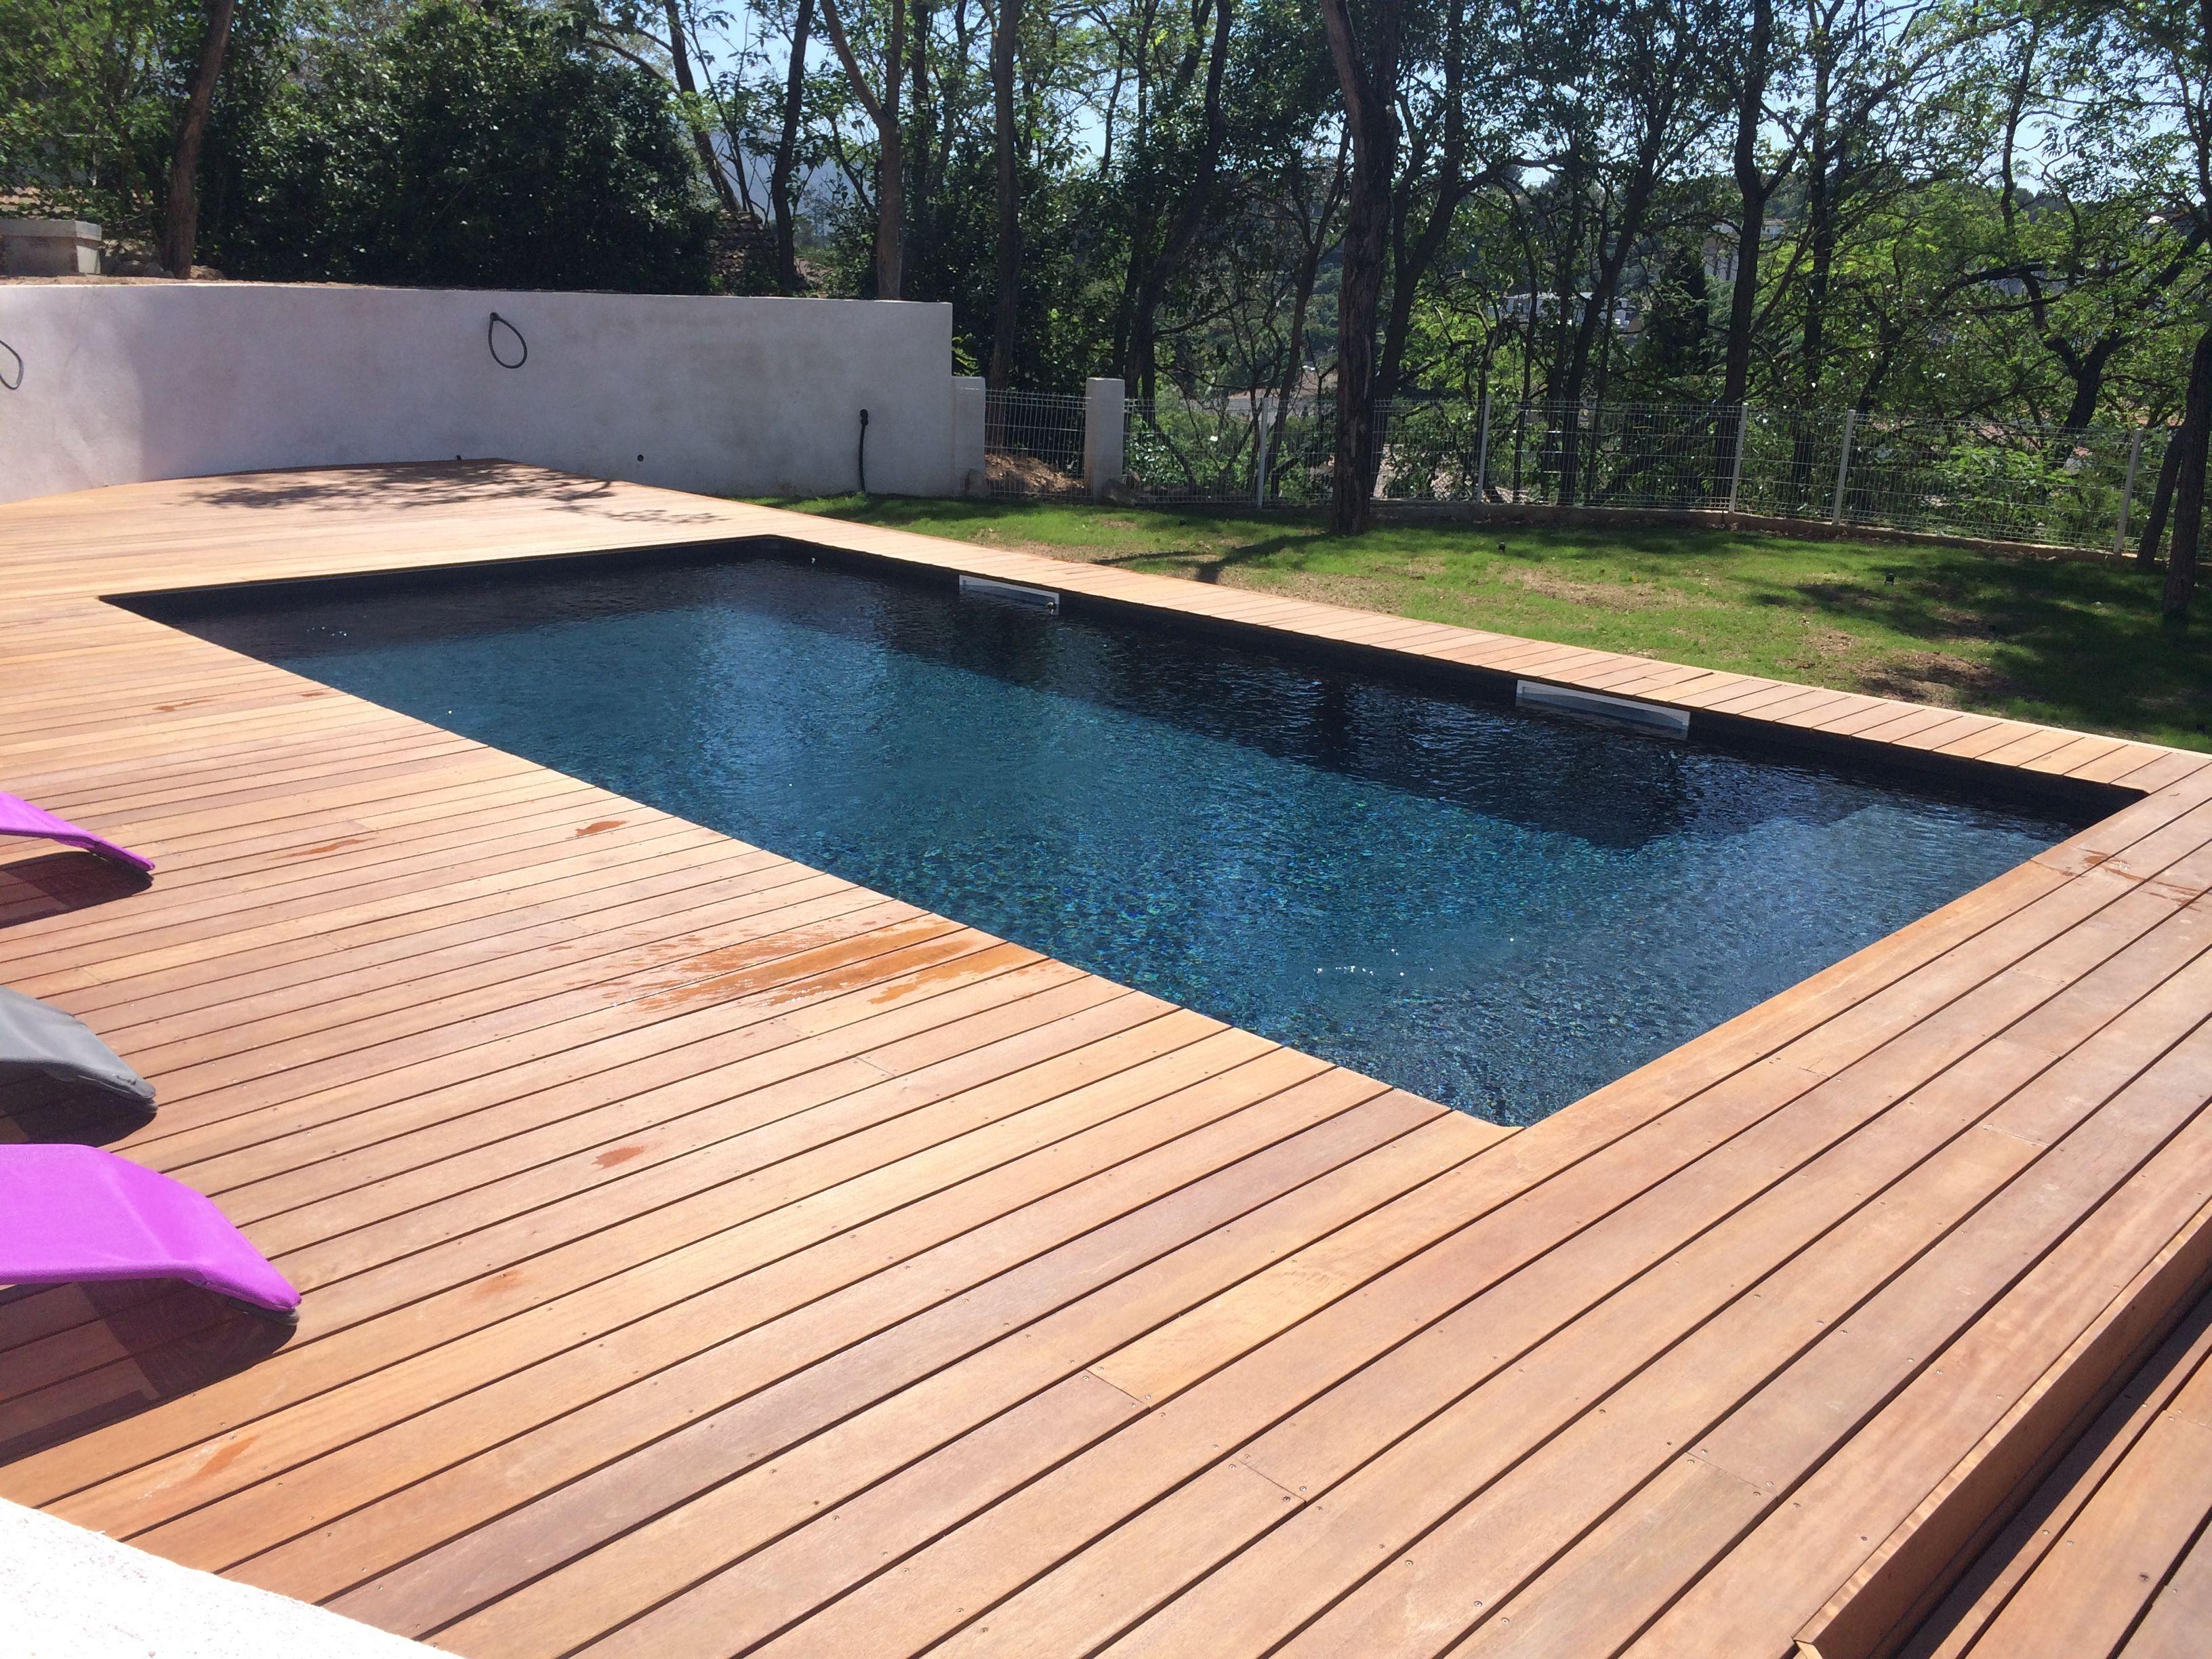 41 Fantastic Outdoor Pool Ideas Piscine Bois Rectangulaire